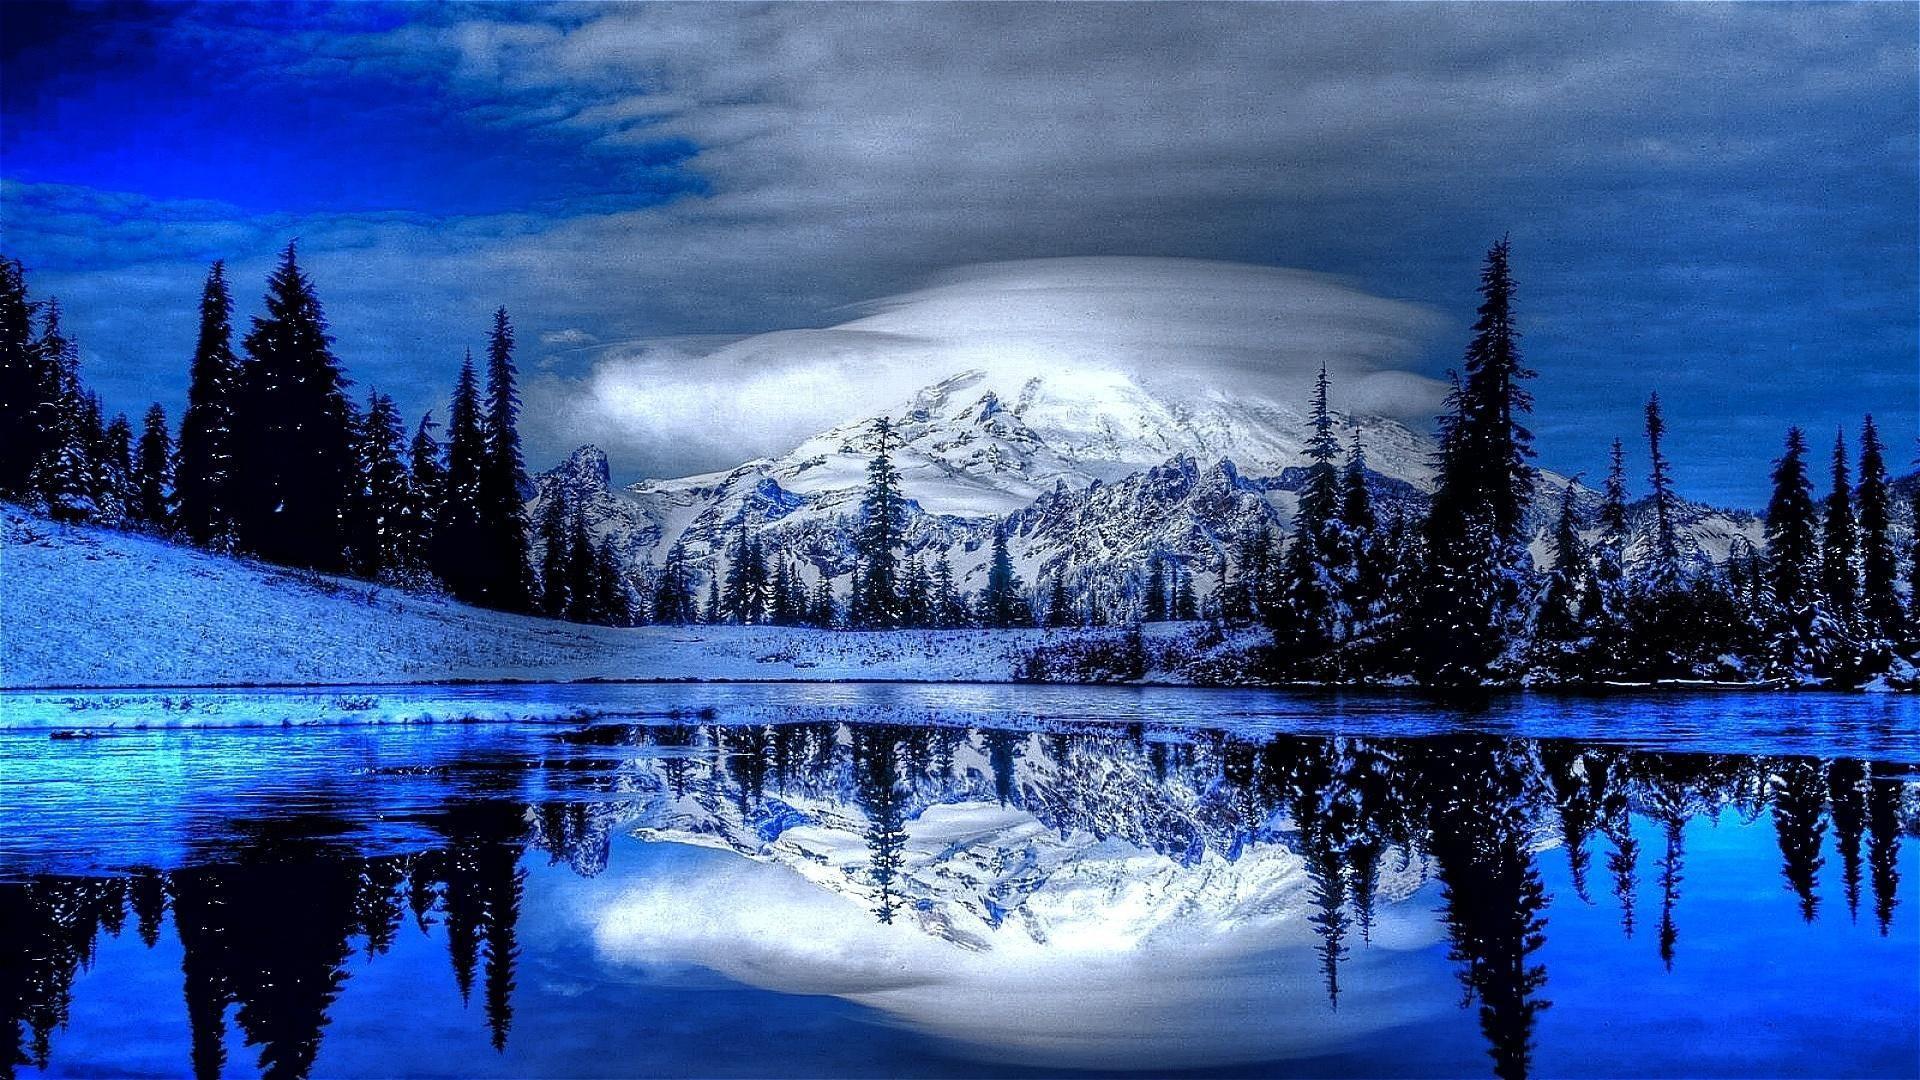 Winter Landscape Desktop Wallpapers and Backgrounds Cool